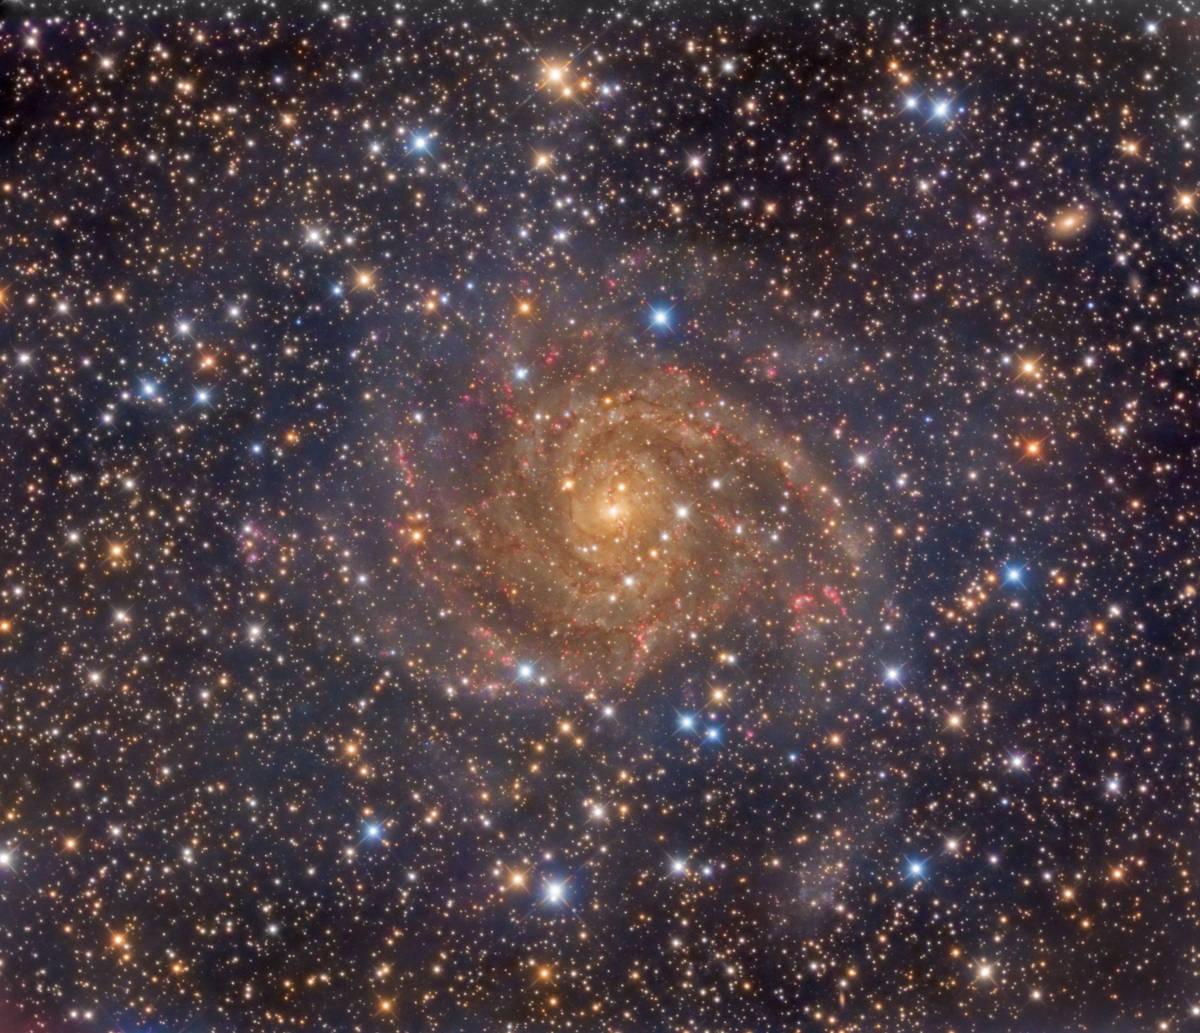 La galaxia escondida IC 342